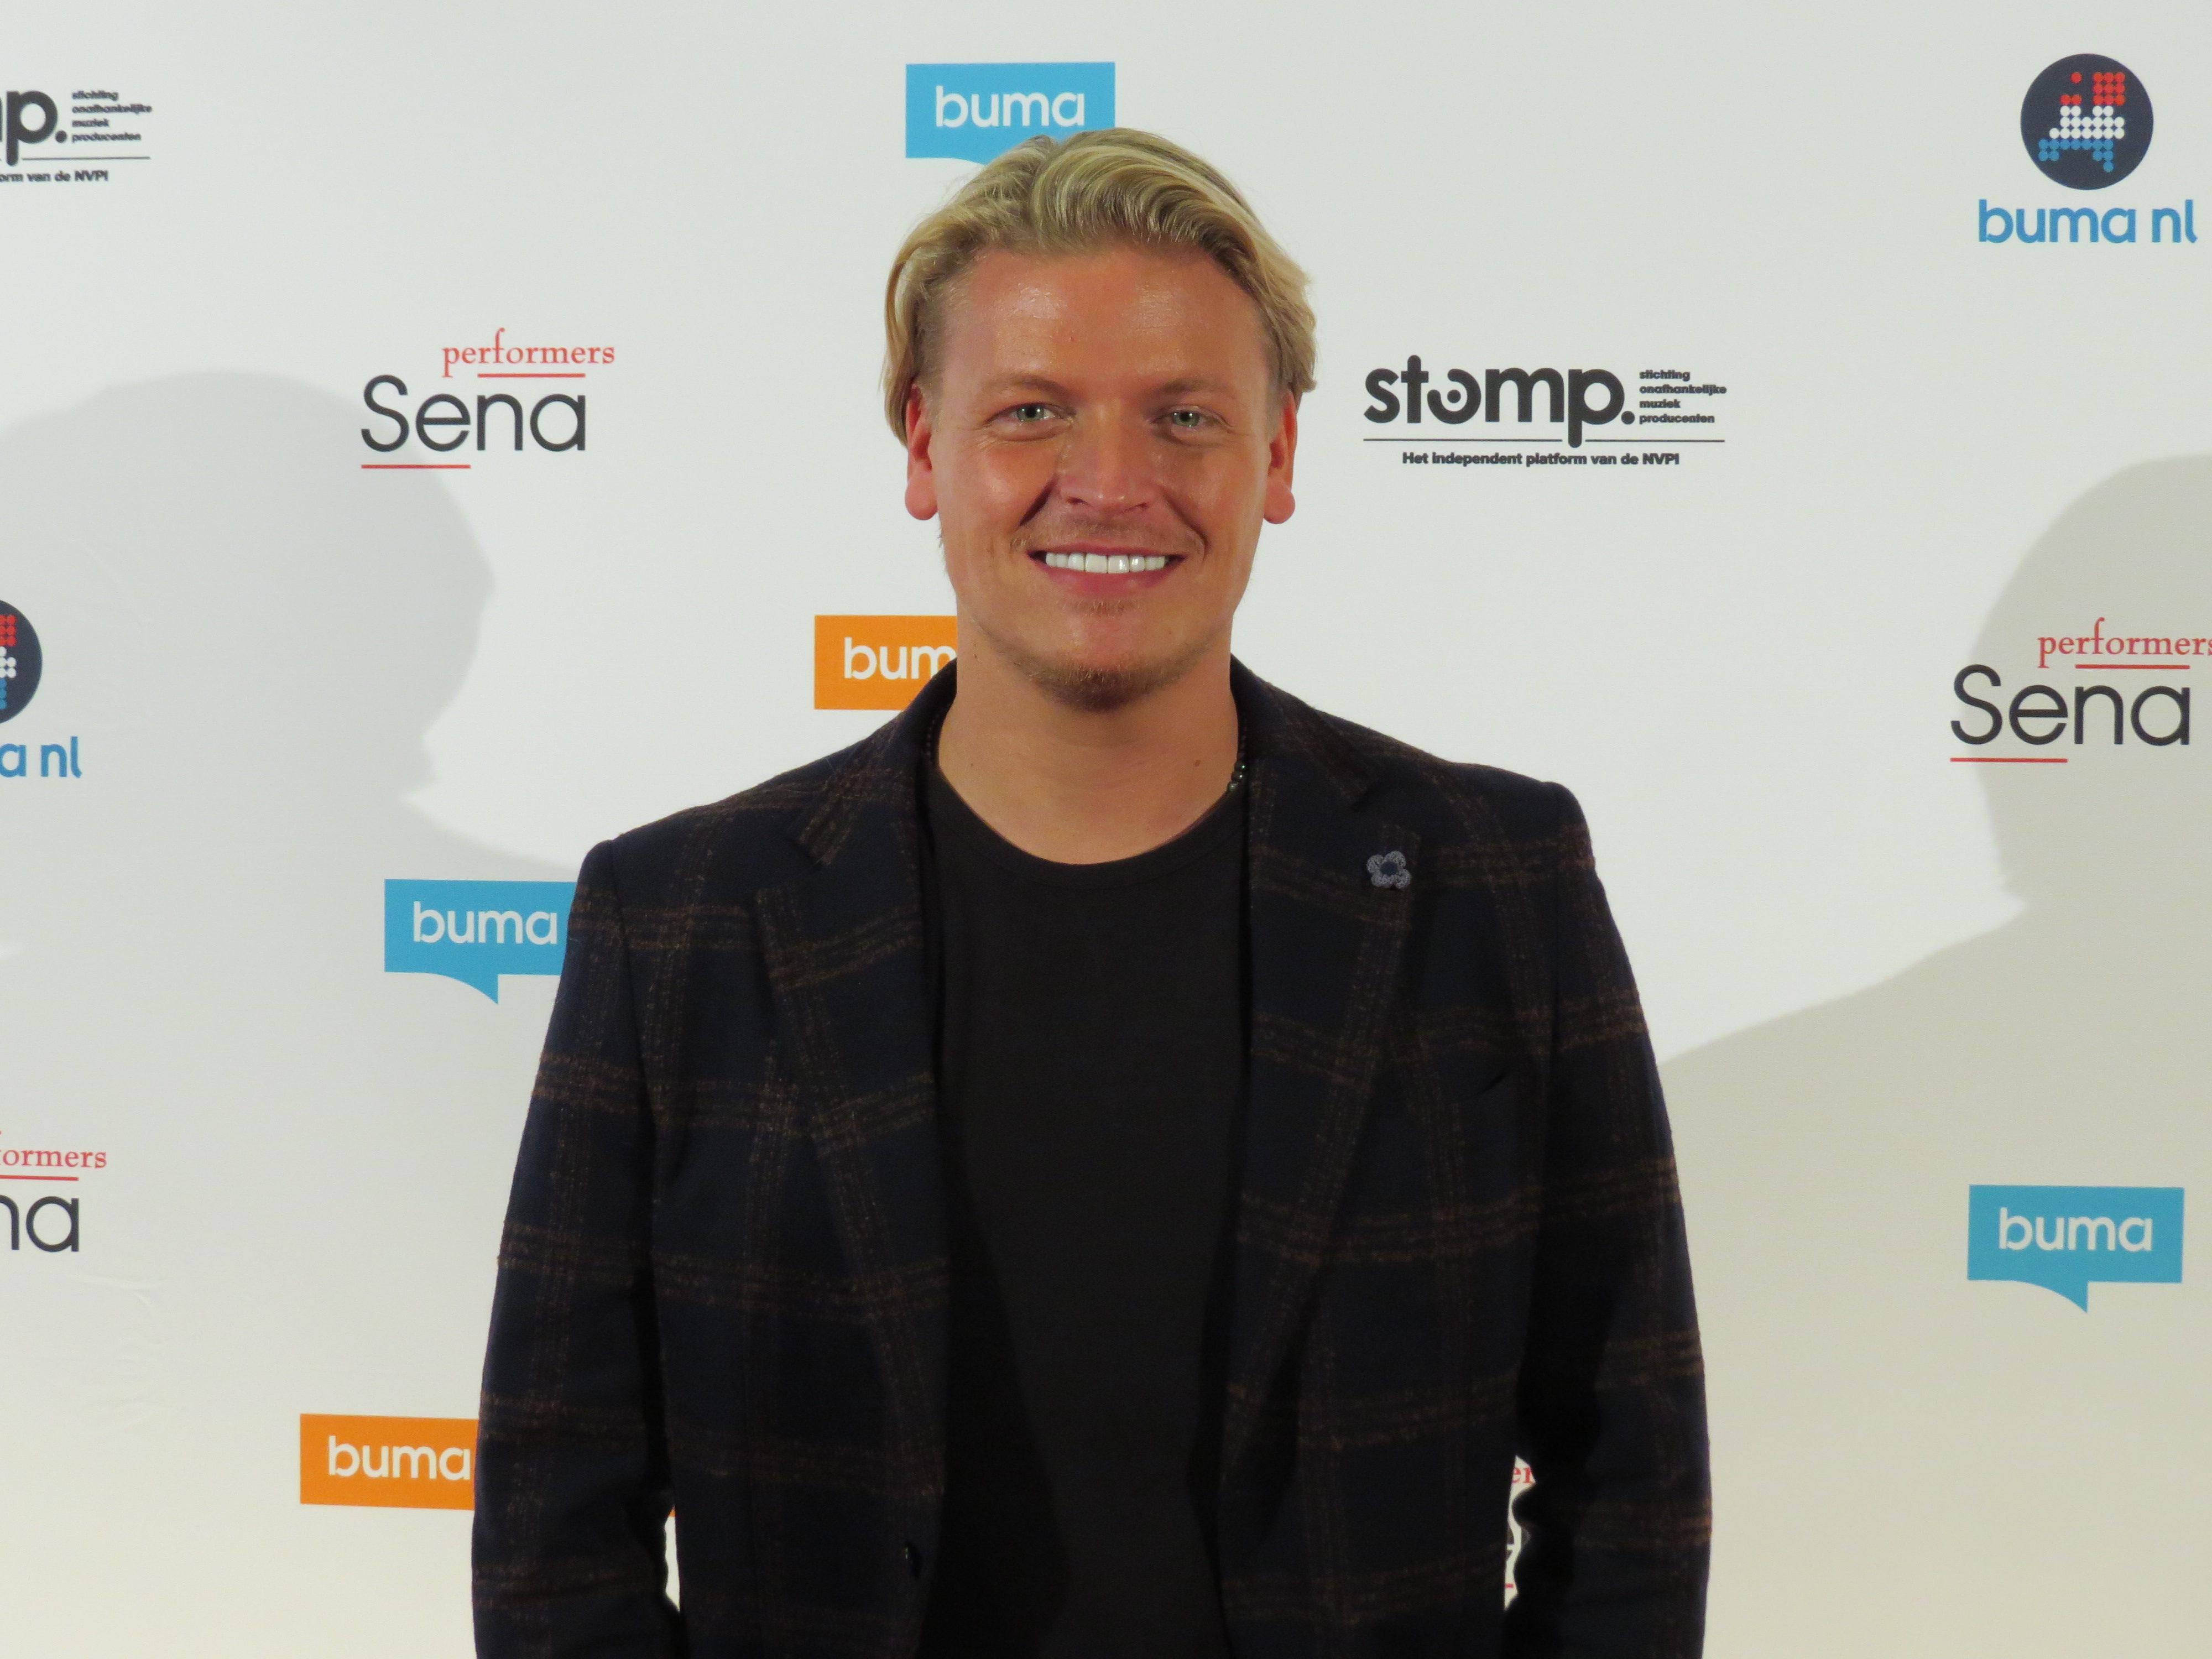 Thomas Berge tijdens Buma NL Awards 2019 - Michael Dijkstra (Artiesten Nieuws)